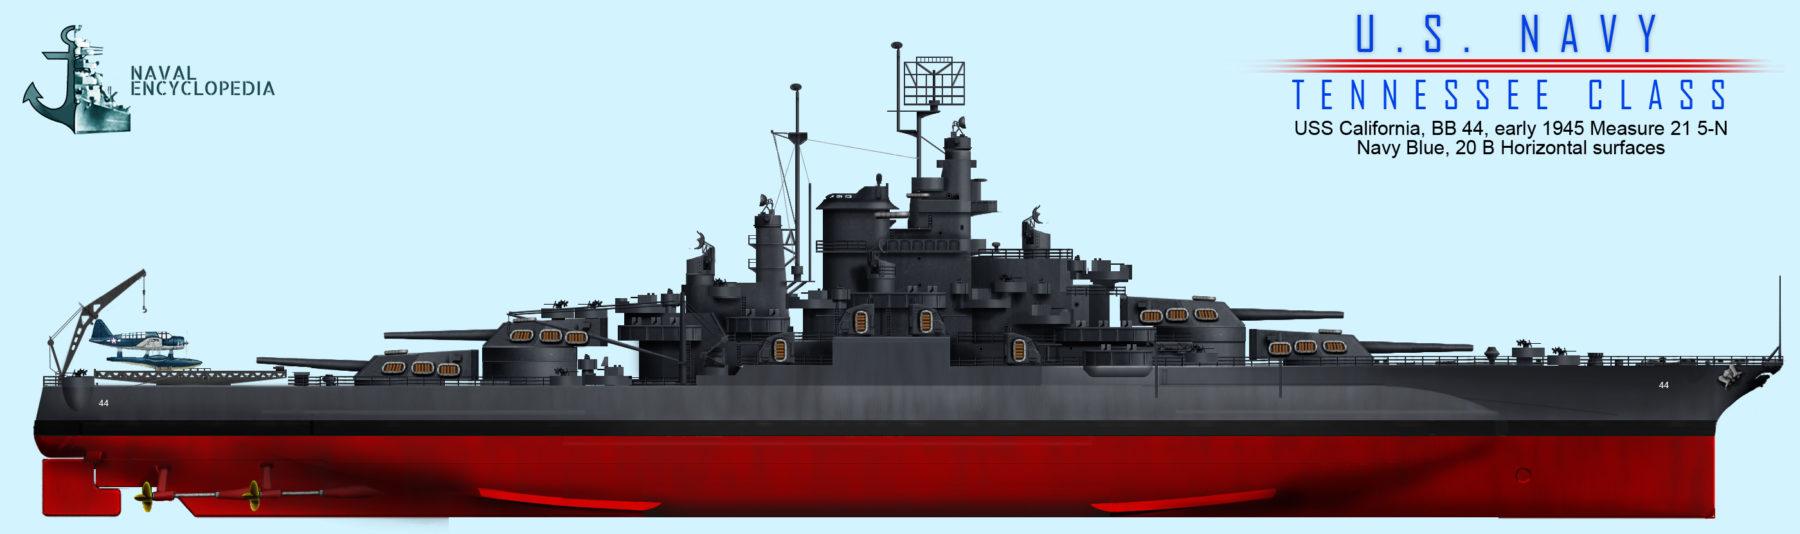 USS California in 1945